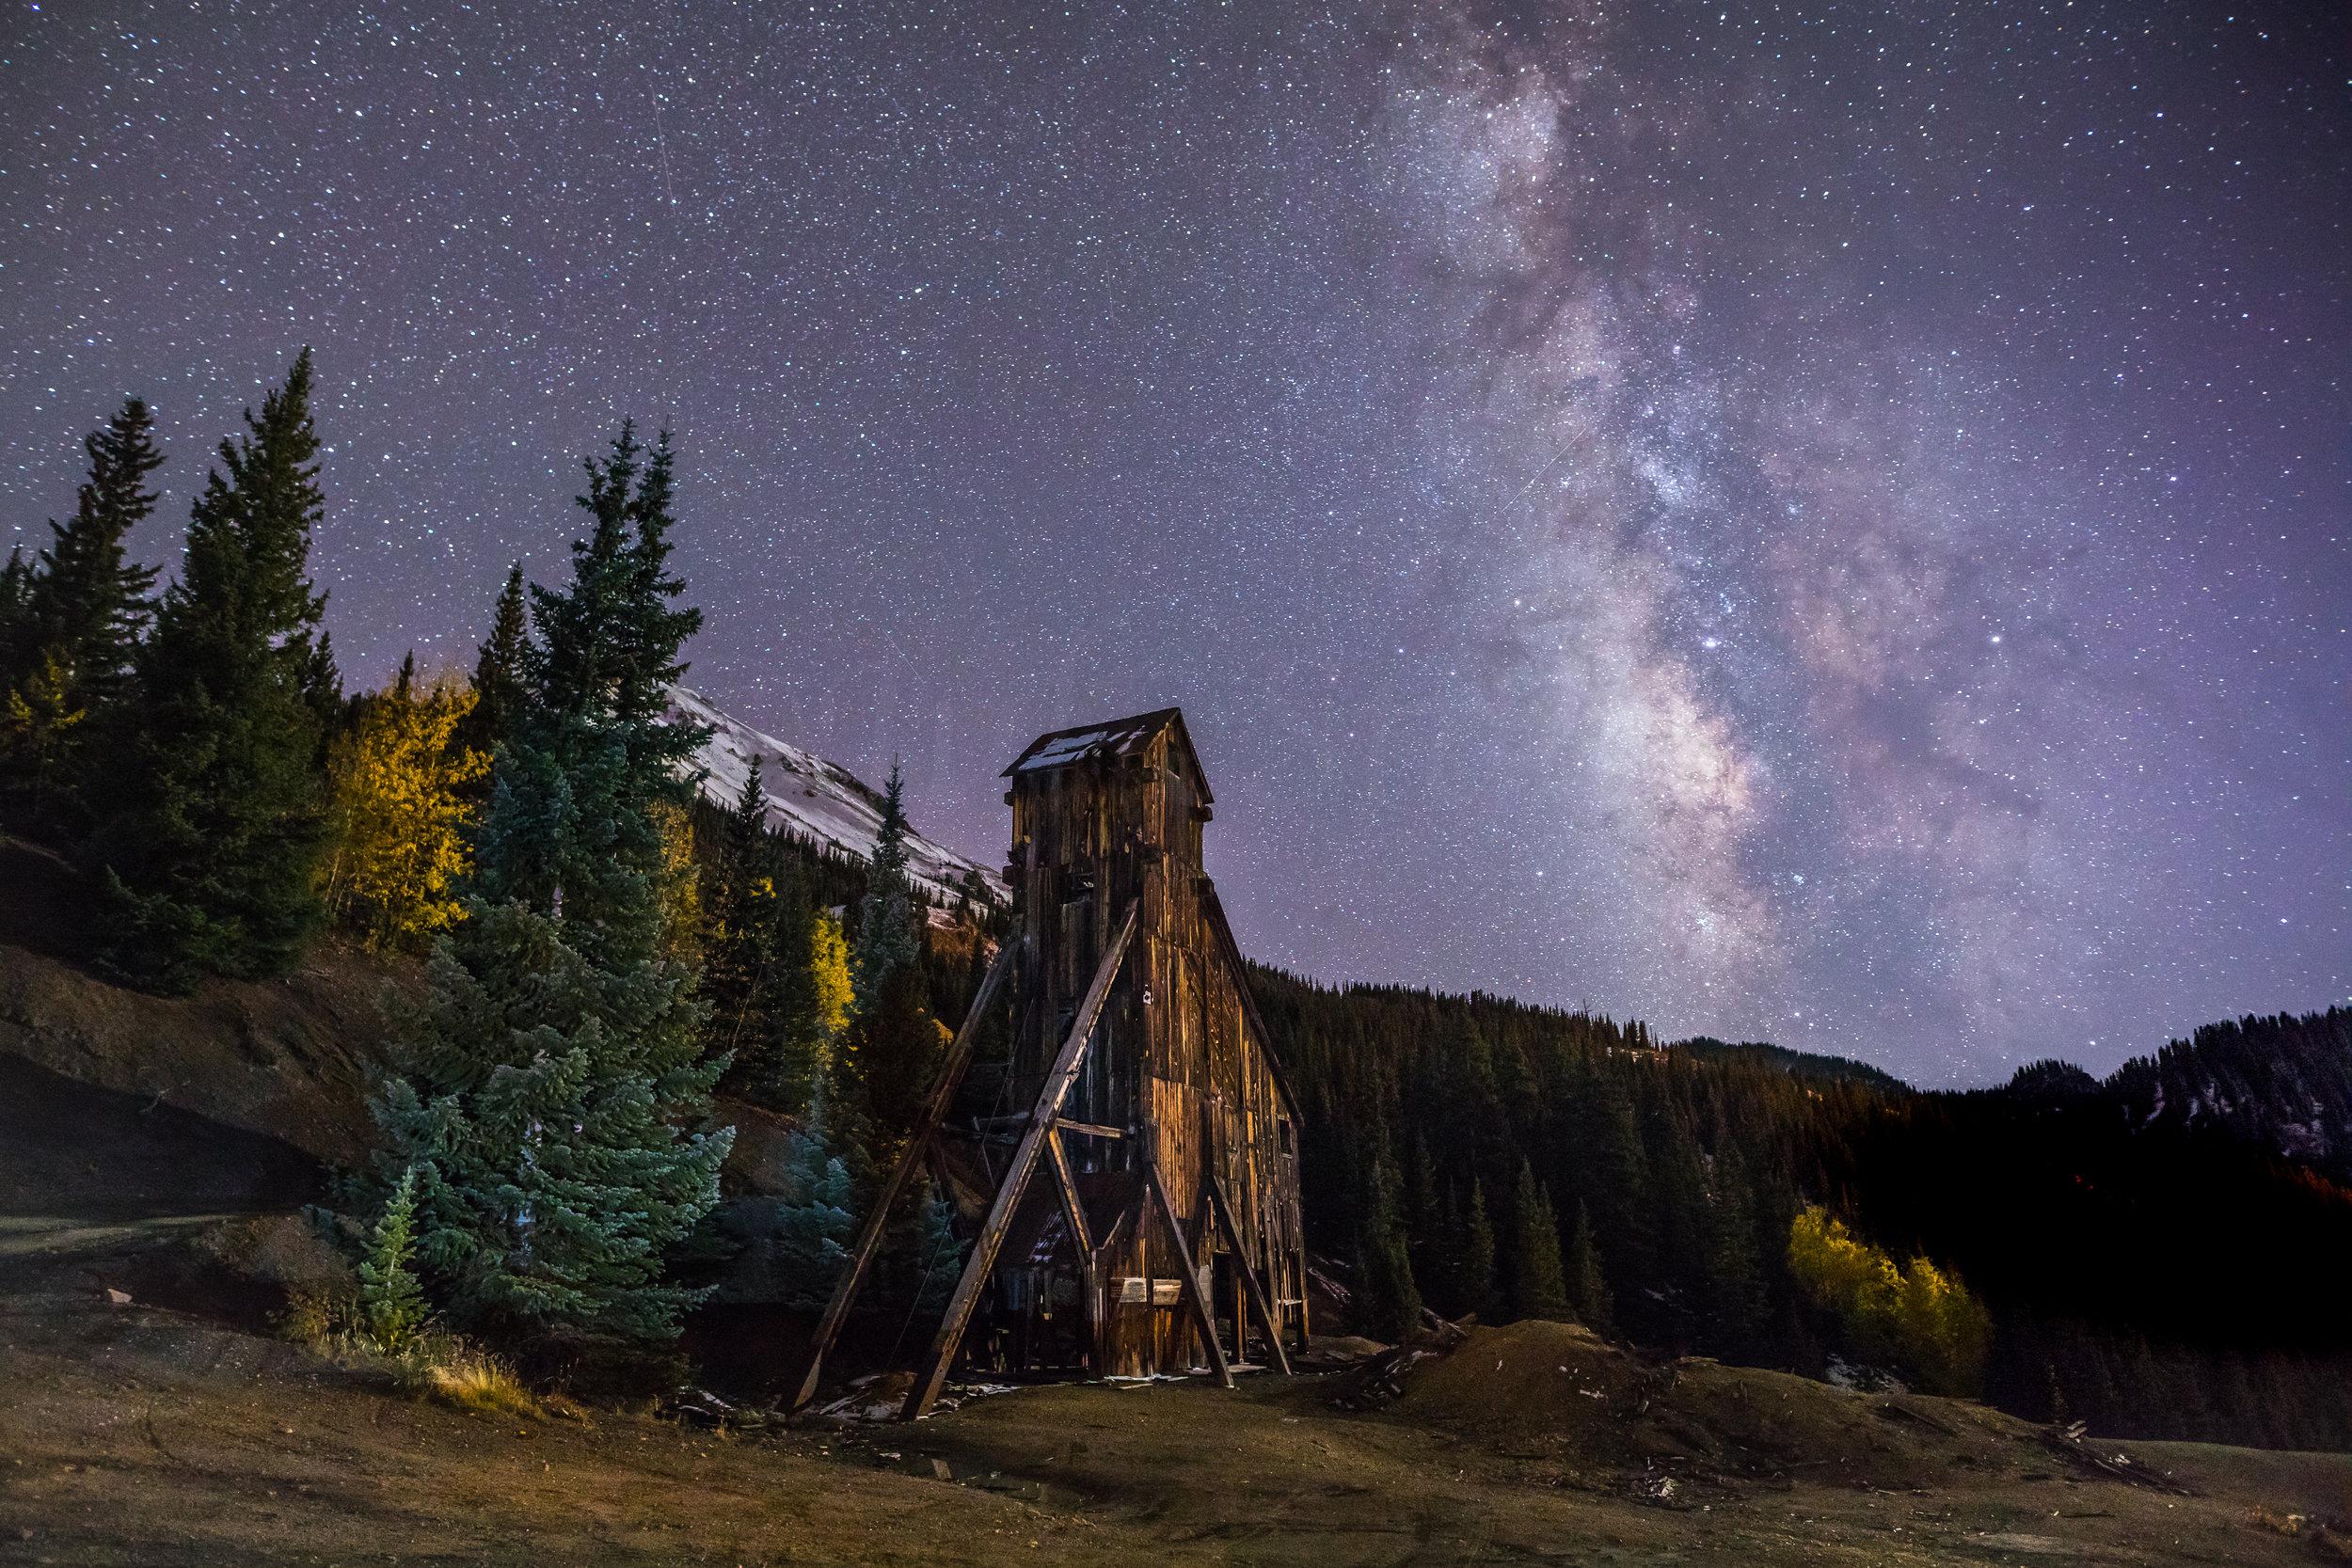 Milky way over Yankee Girl Mine, Image # 5458